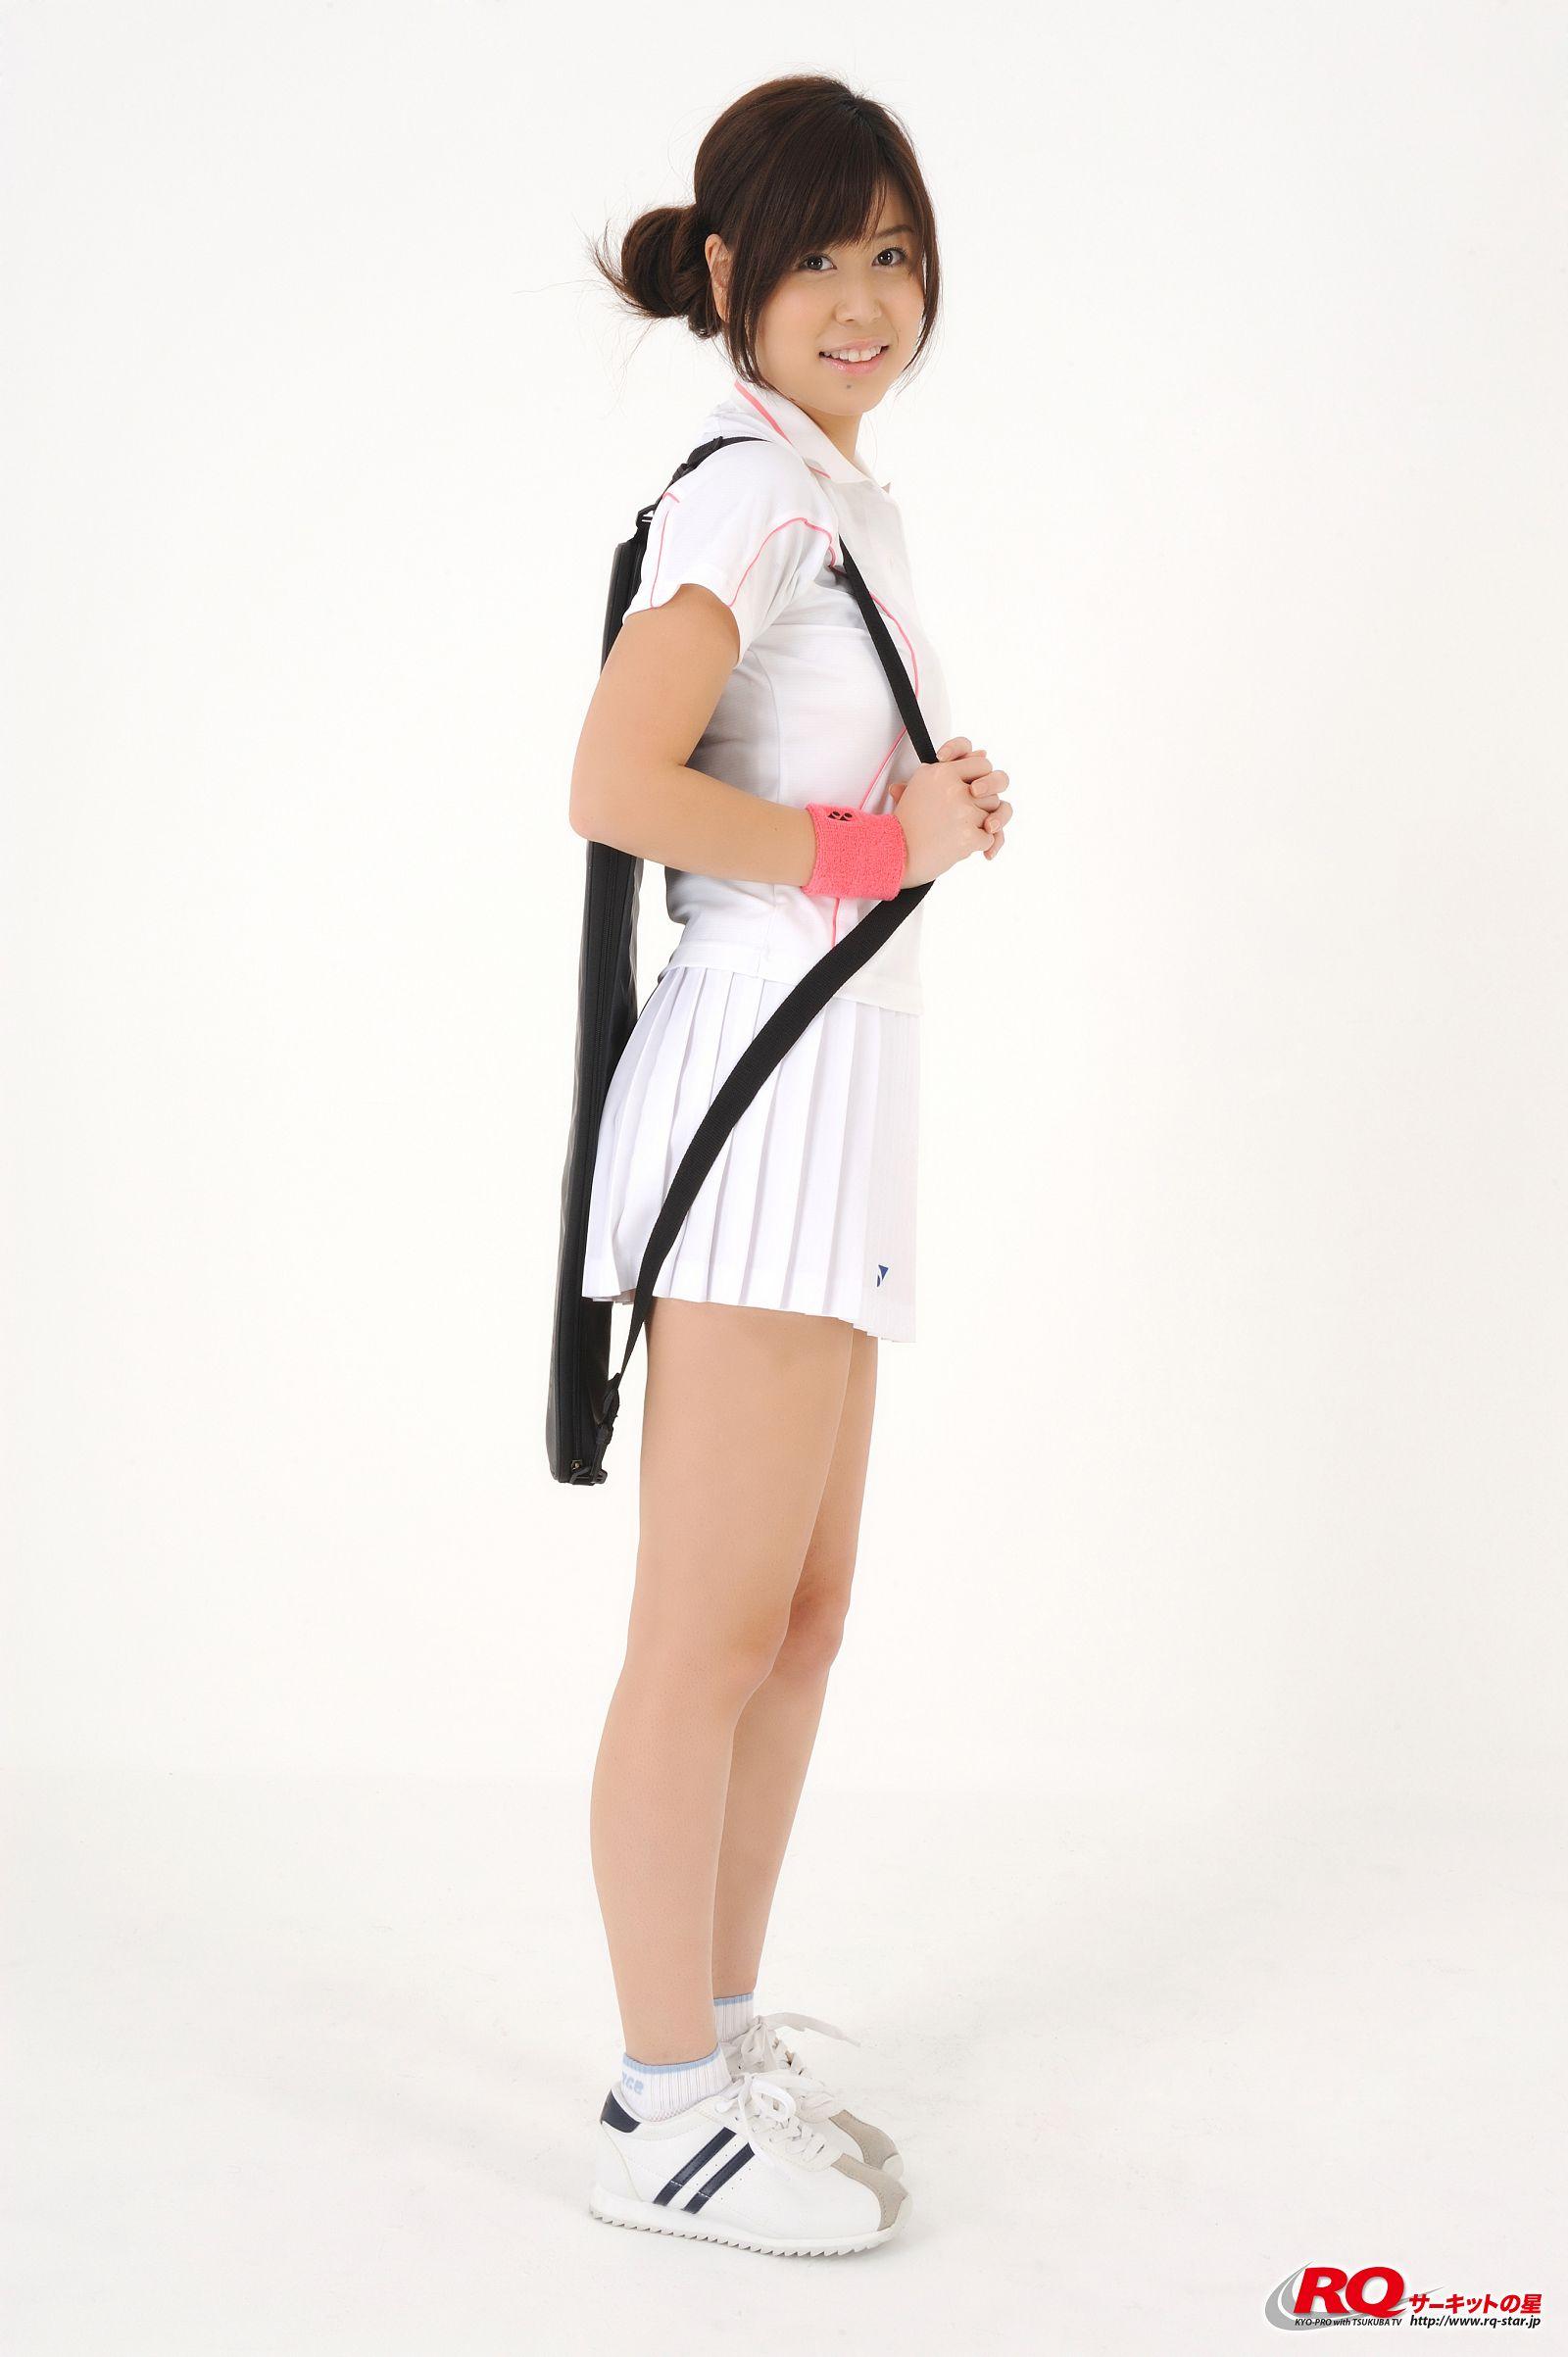 [RQ STAR美女] NO.01120 Airi Nagasaku 永作あいり Tennis Wea[50P] RQ STAR 第1张